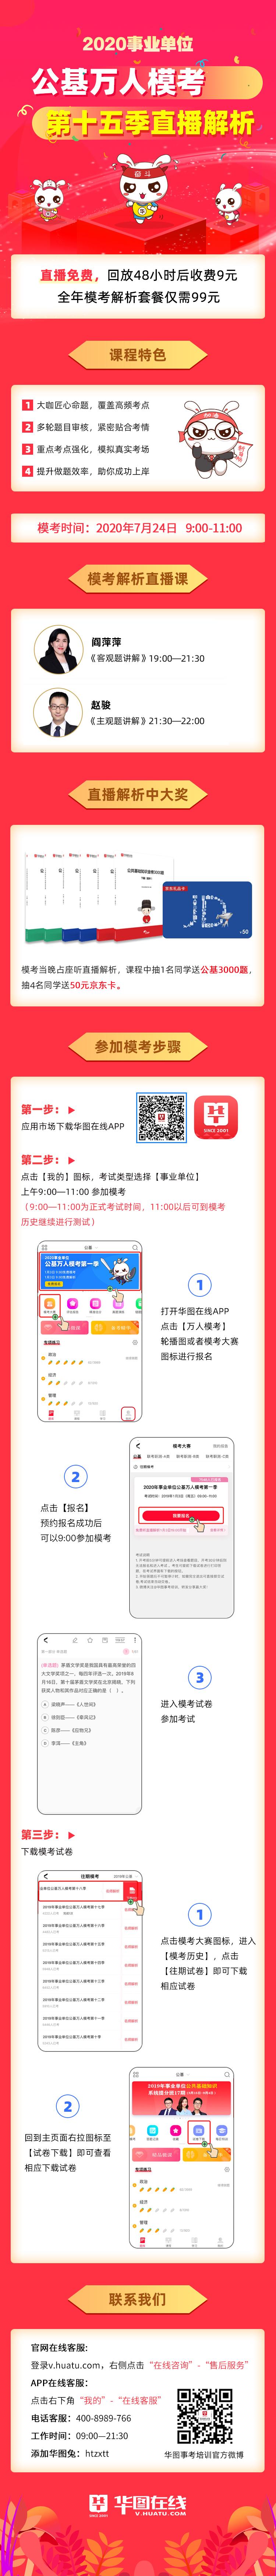 http://upload.htexam.com/userimg/1594100315.jpg